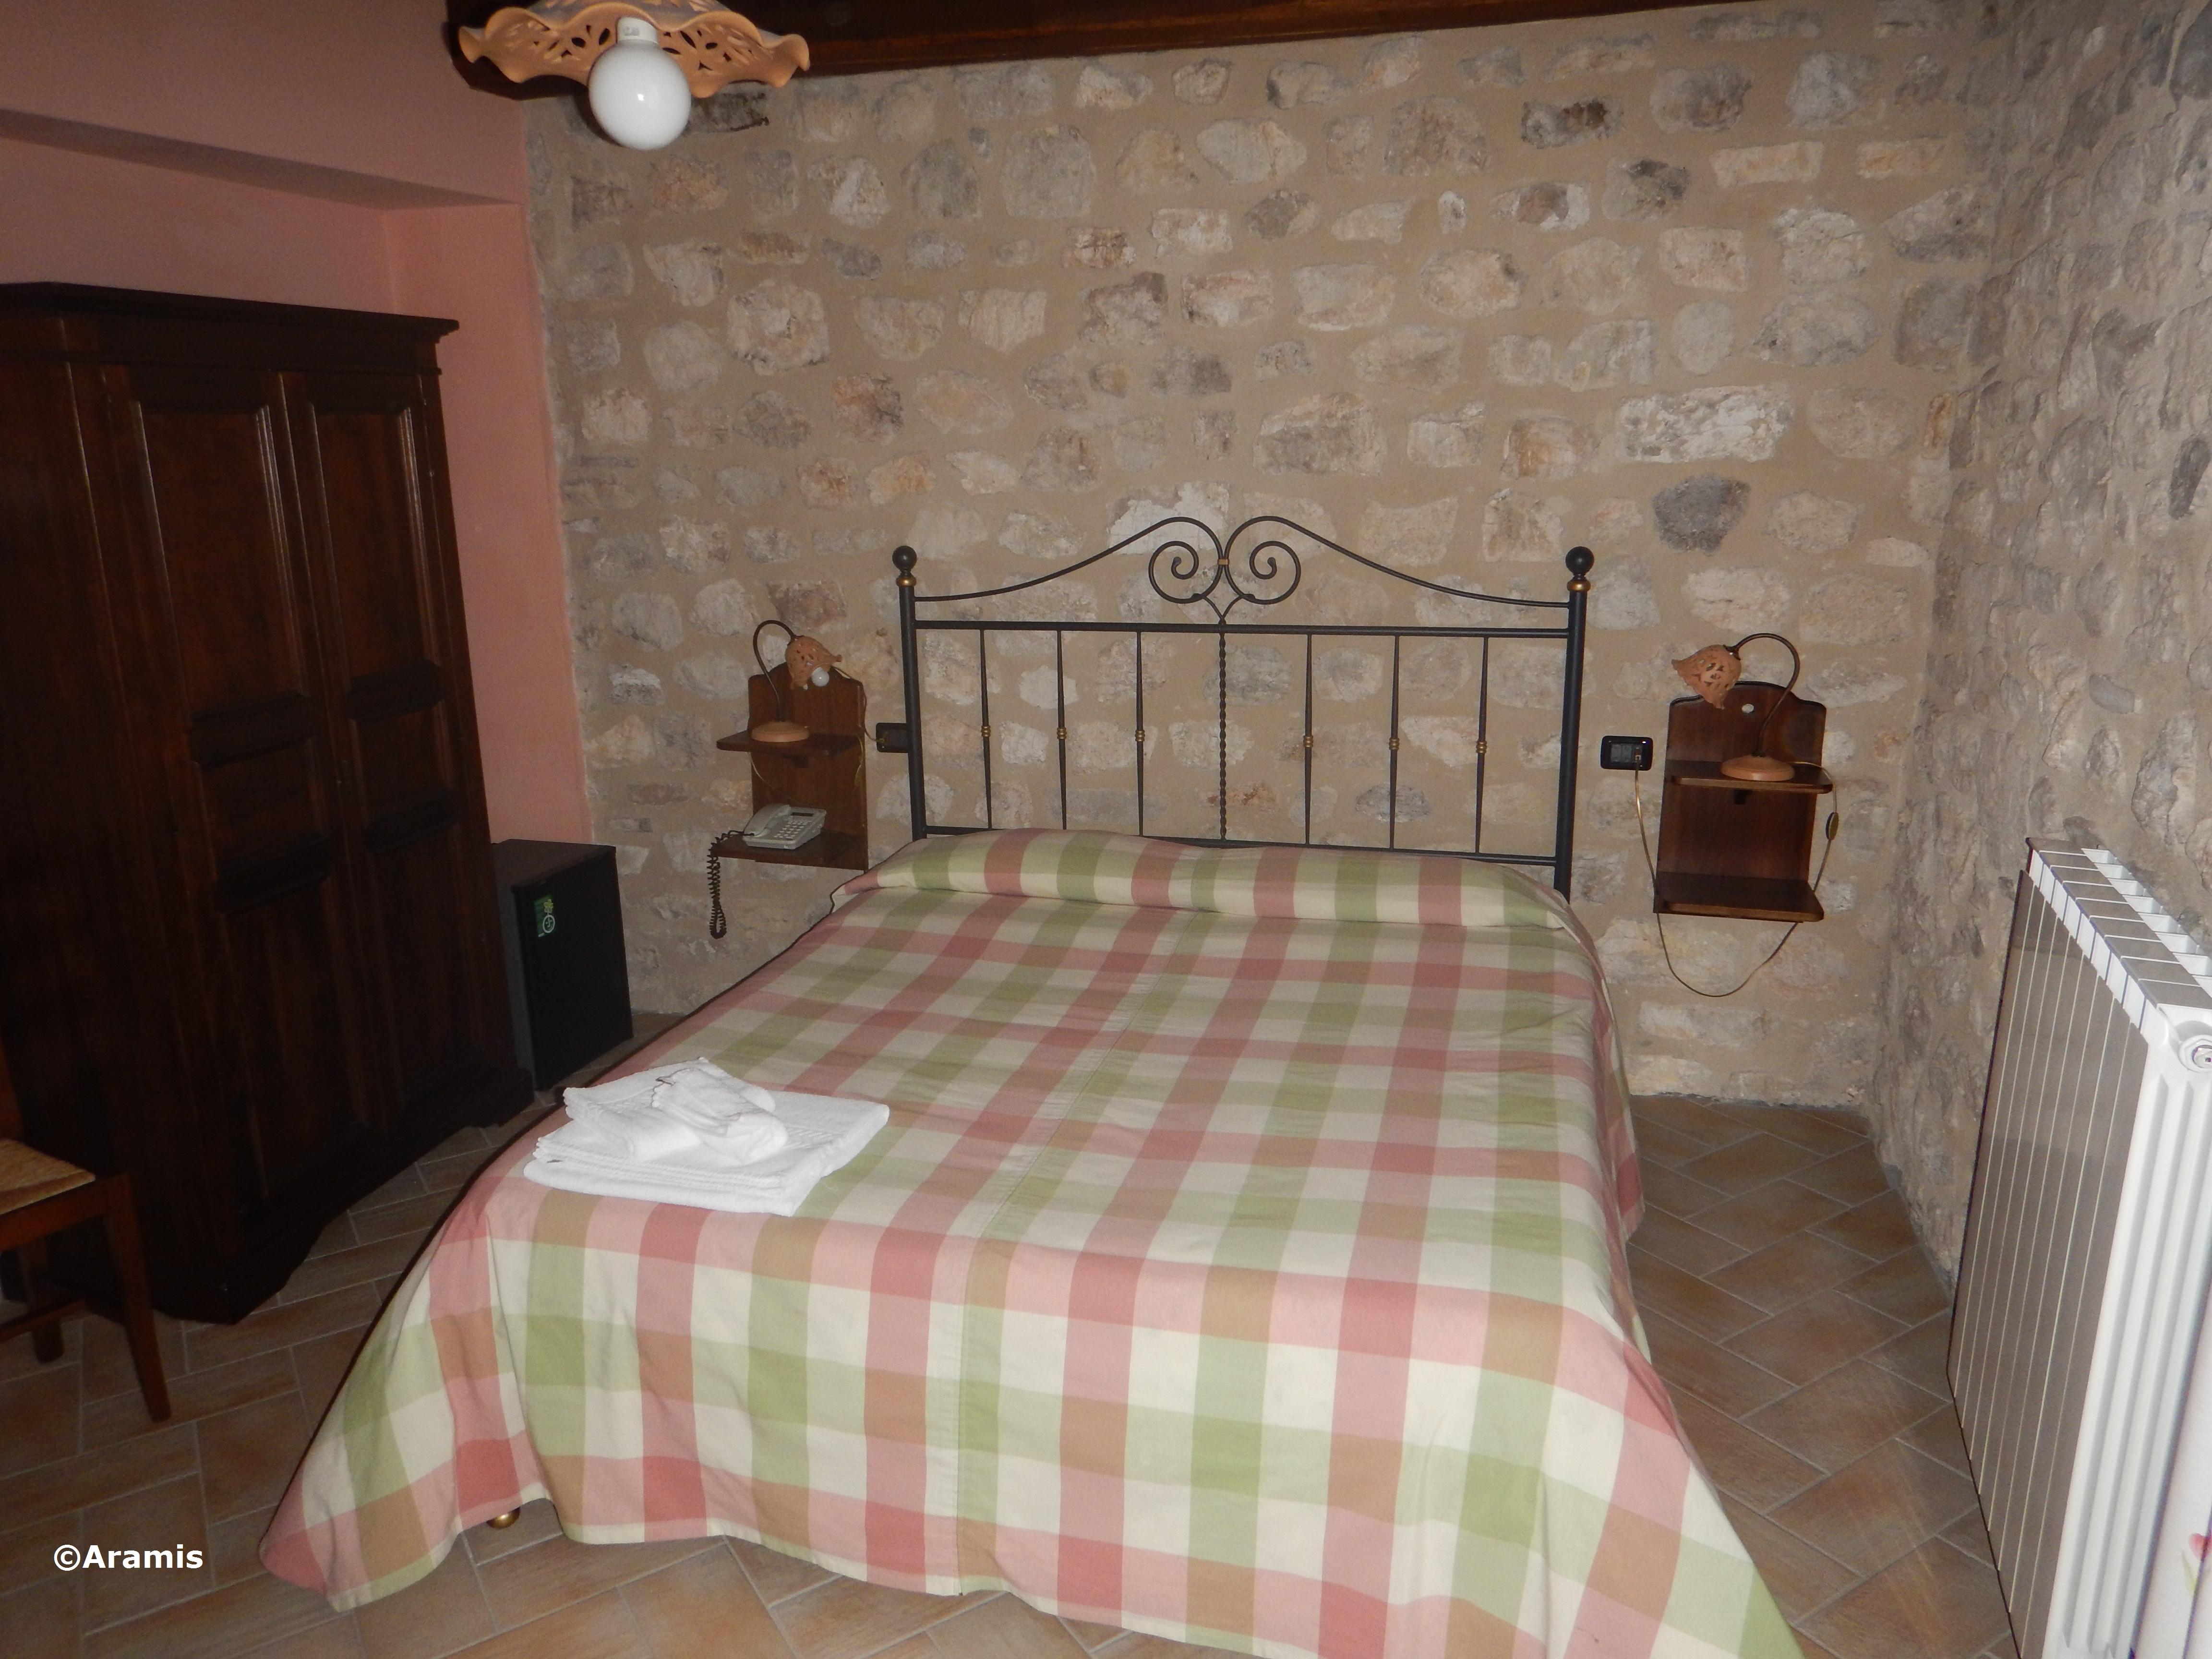 Hotel_RoccaRanne_stanze